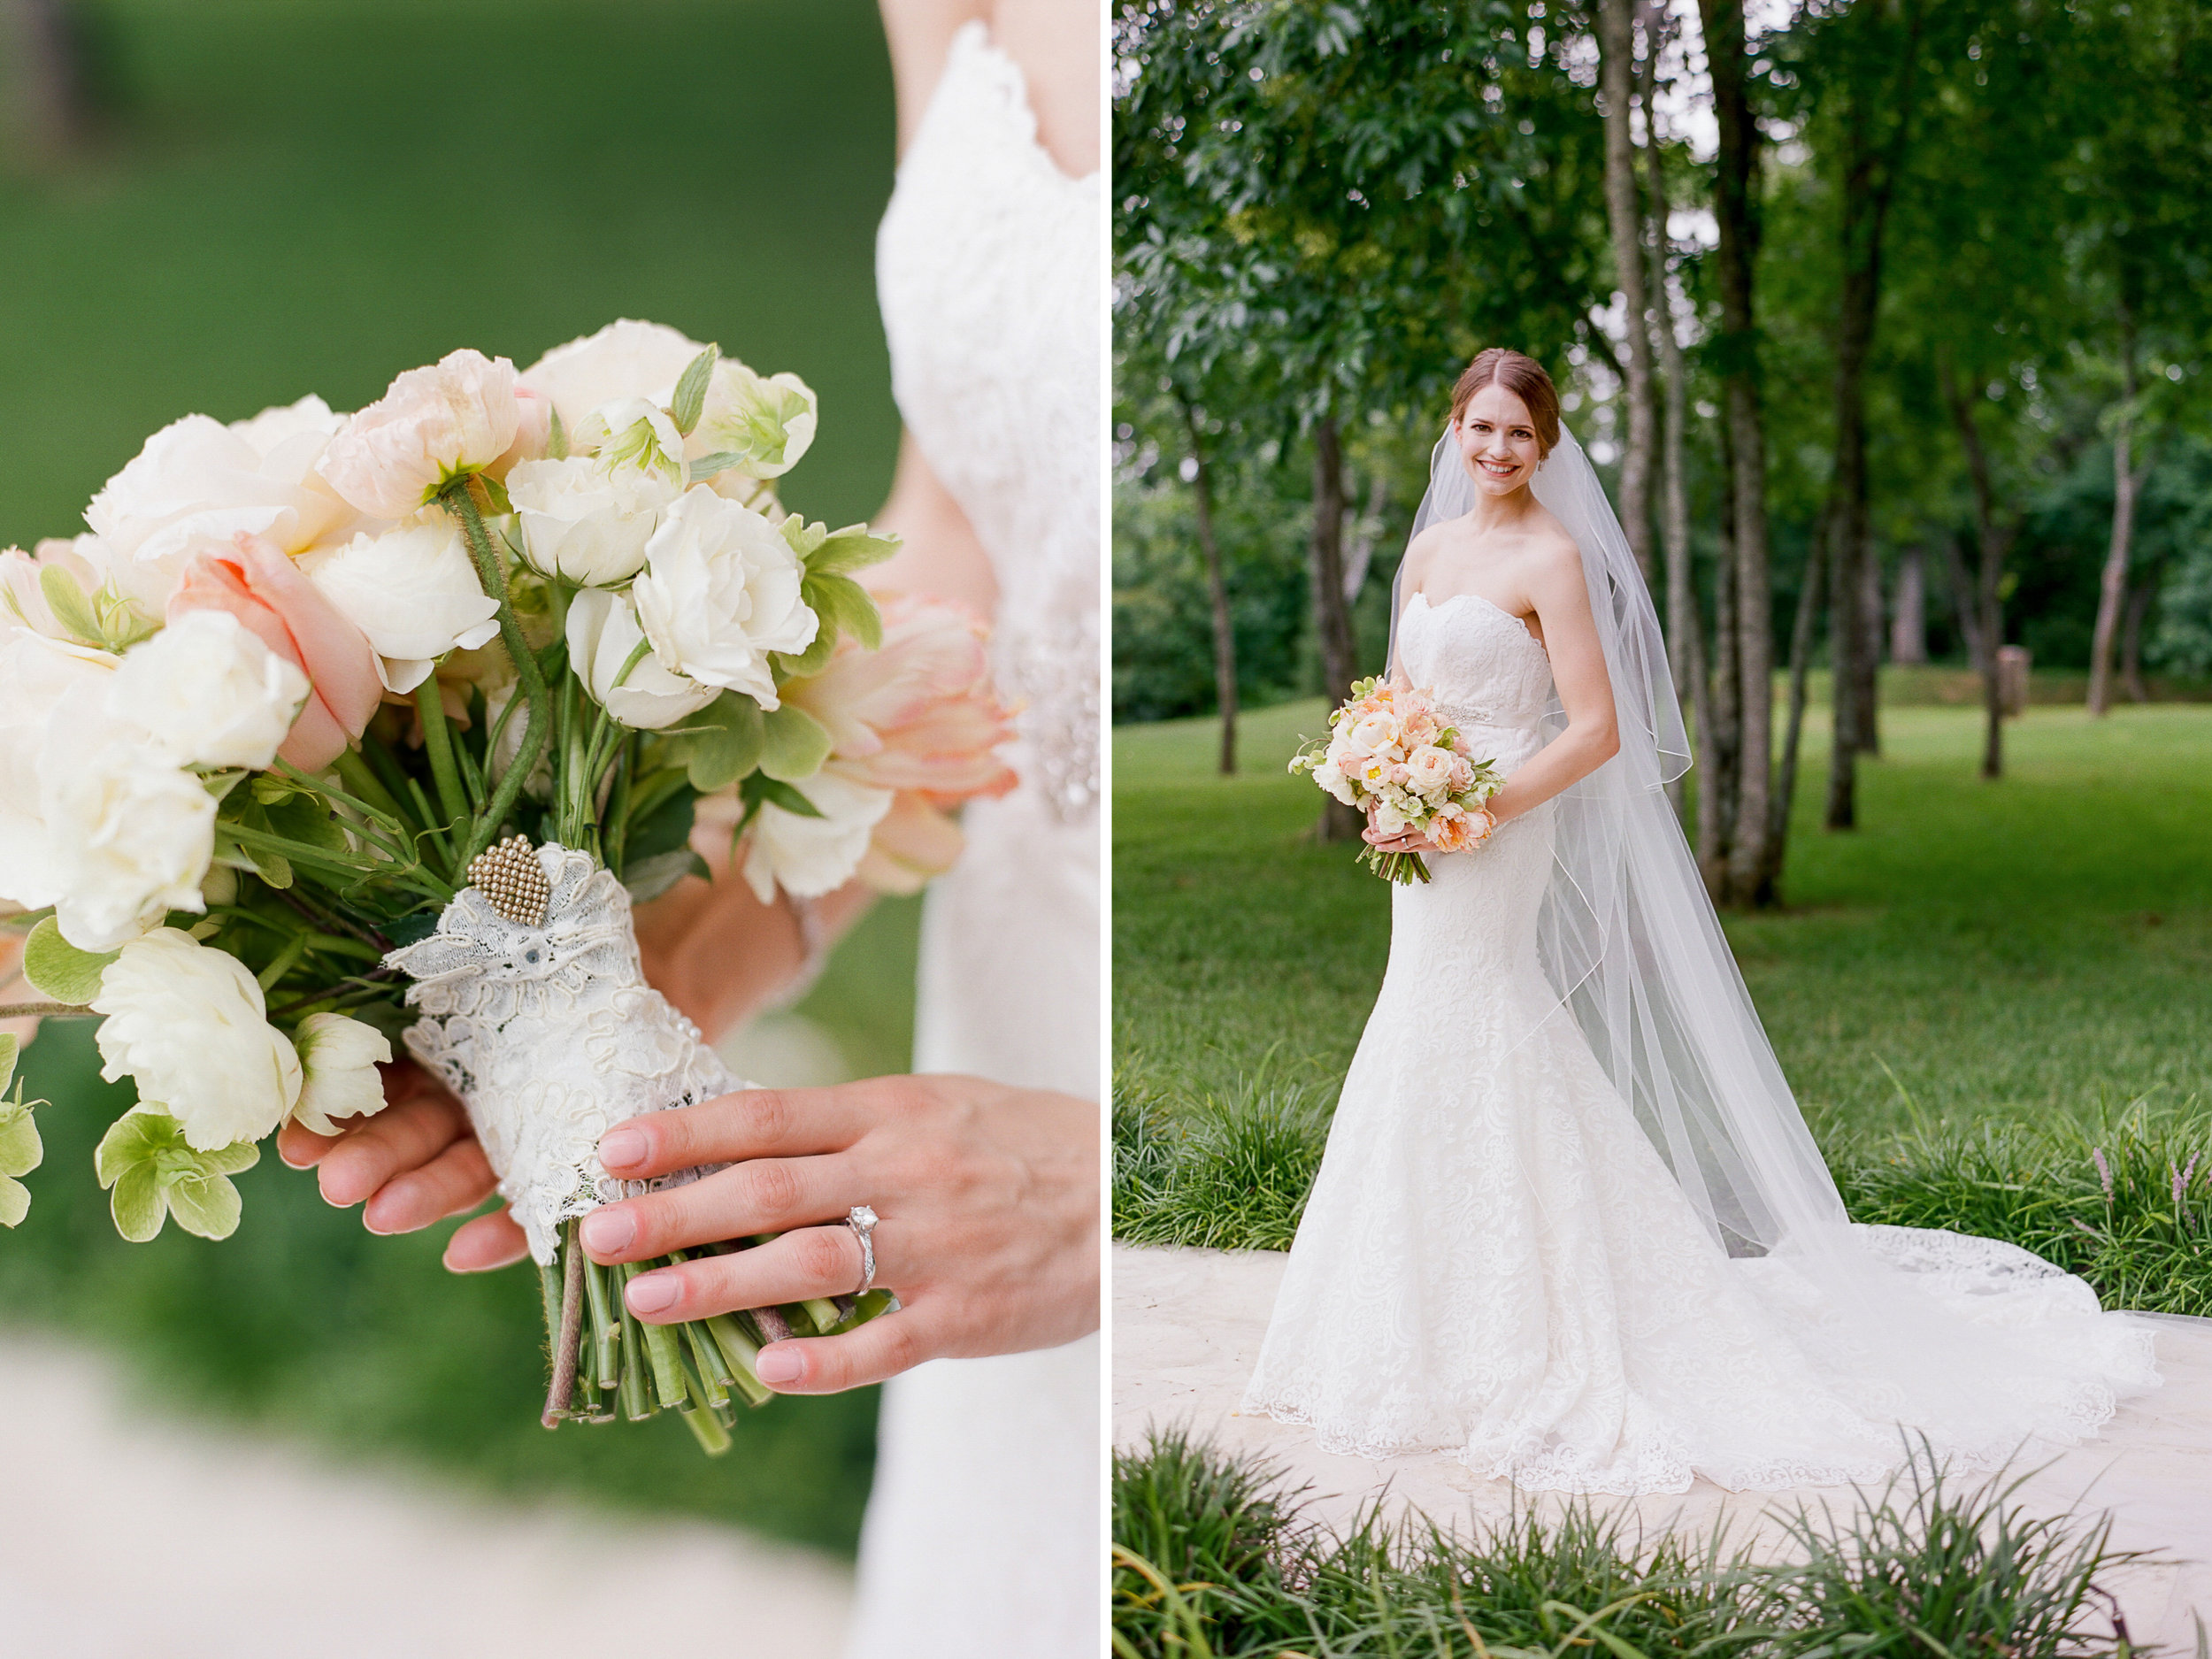 The-Knot-Wedding-Houston-Photographer-Fine-Art-Dana-Fernandez-Photography-Film-112.jpg